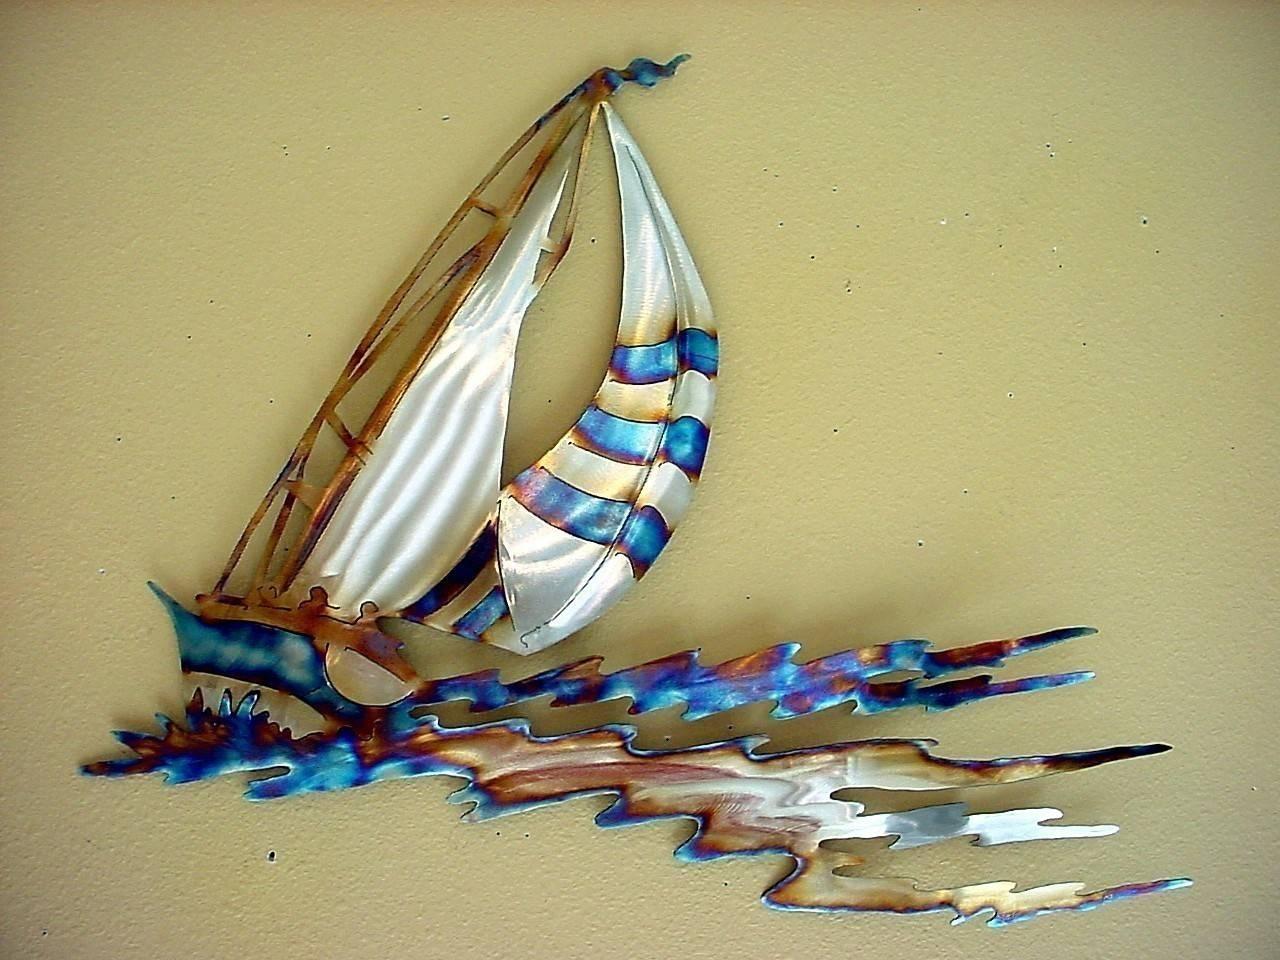 Sailboat Racing Sailor Sailing Stainless Steel Metal Wall Art Throughout Latest Metal Sailboat Wall Art (View 1 of 30)